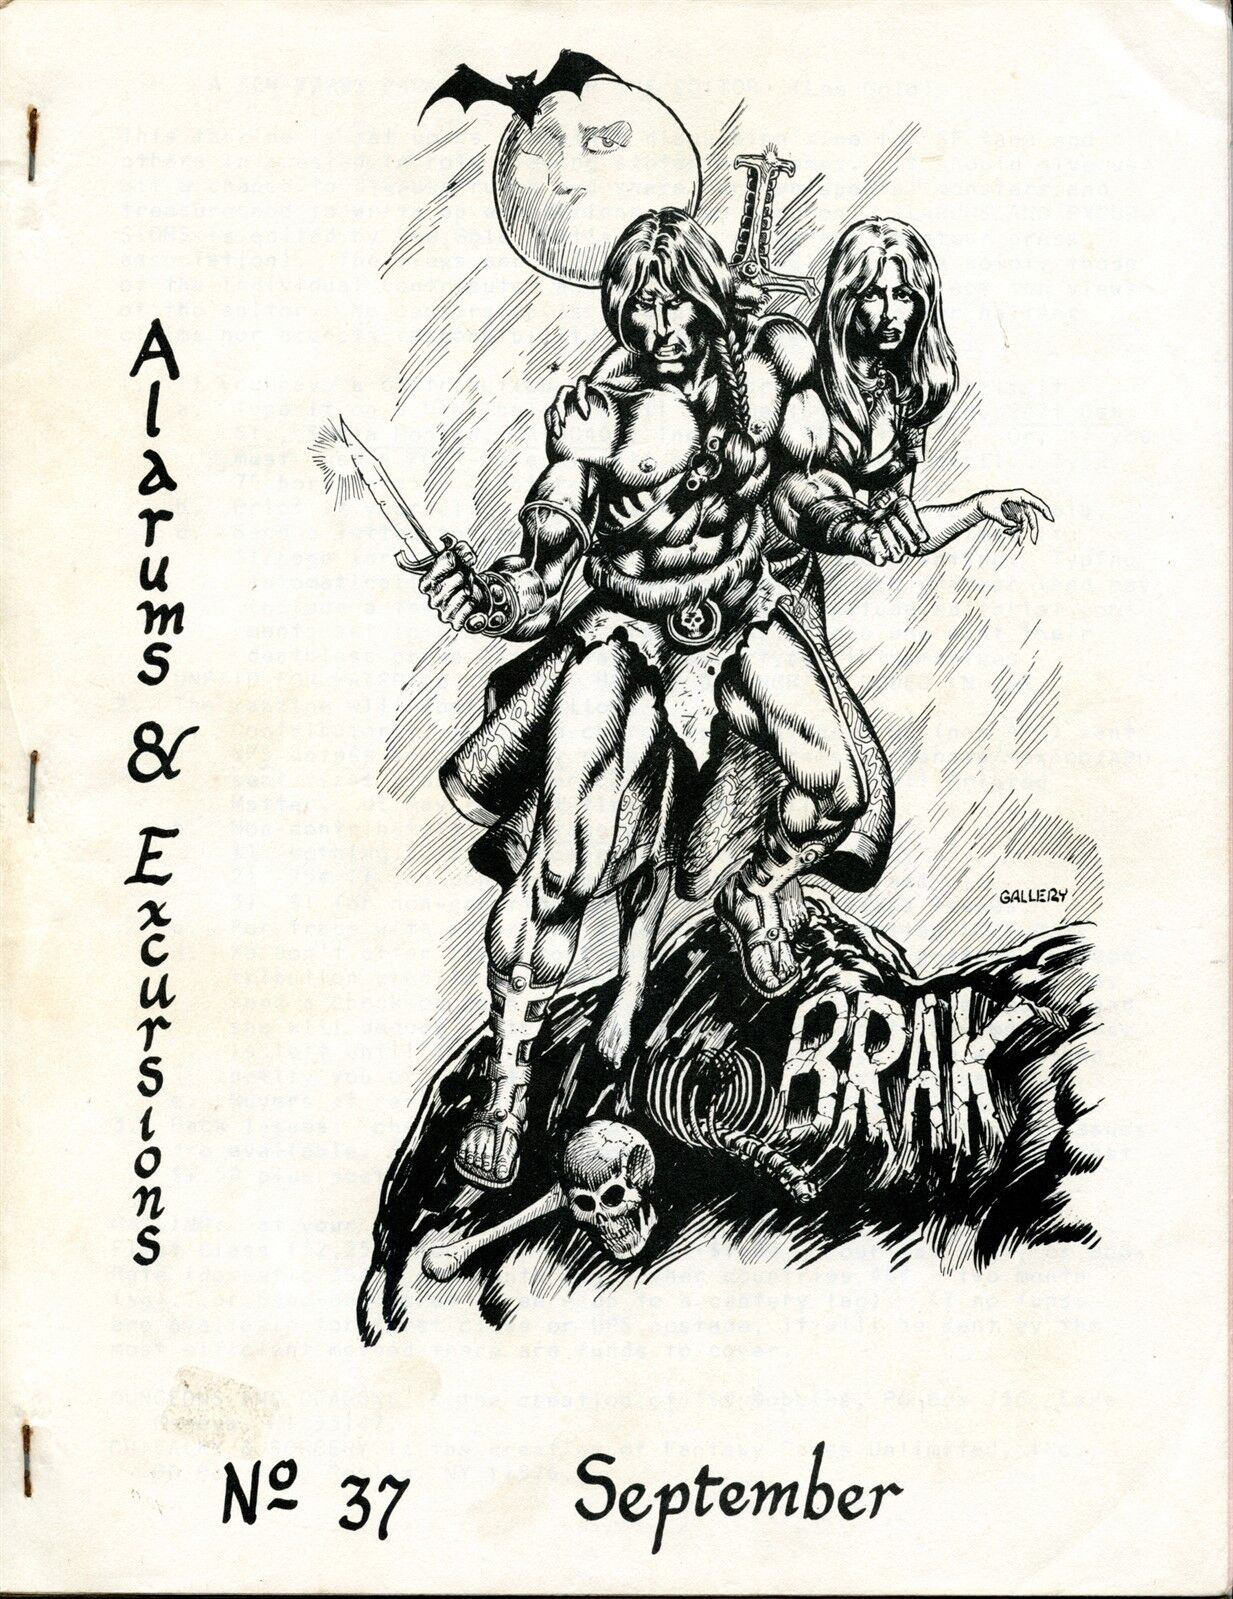 ALARUMS & EXCURSIONS SEPT EXC  Dungeons & Dragons RPG MAGAZINE